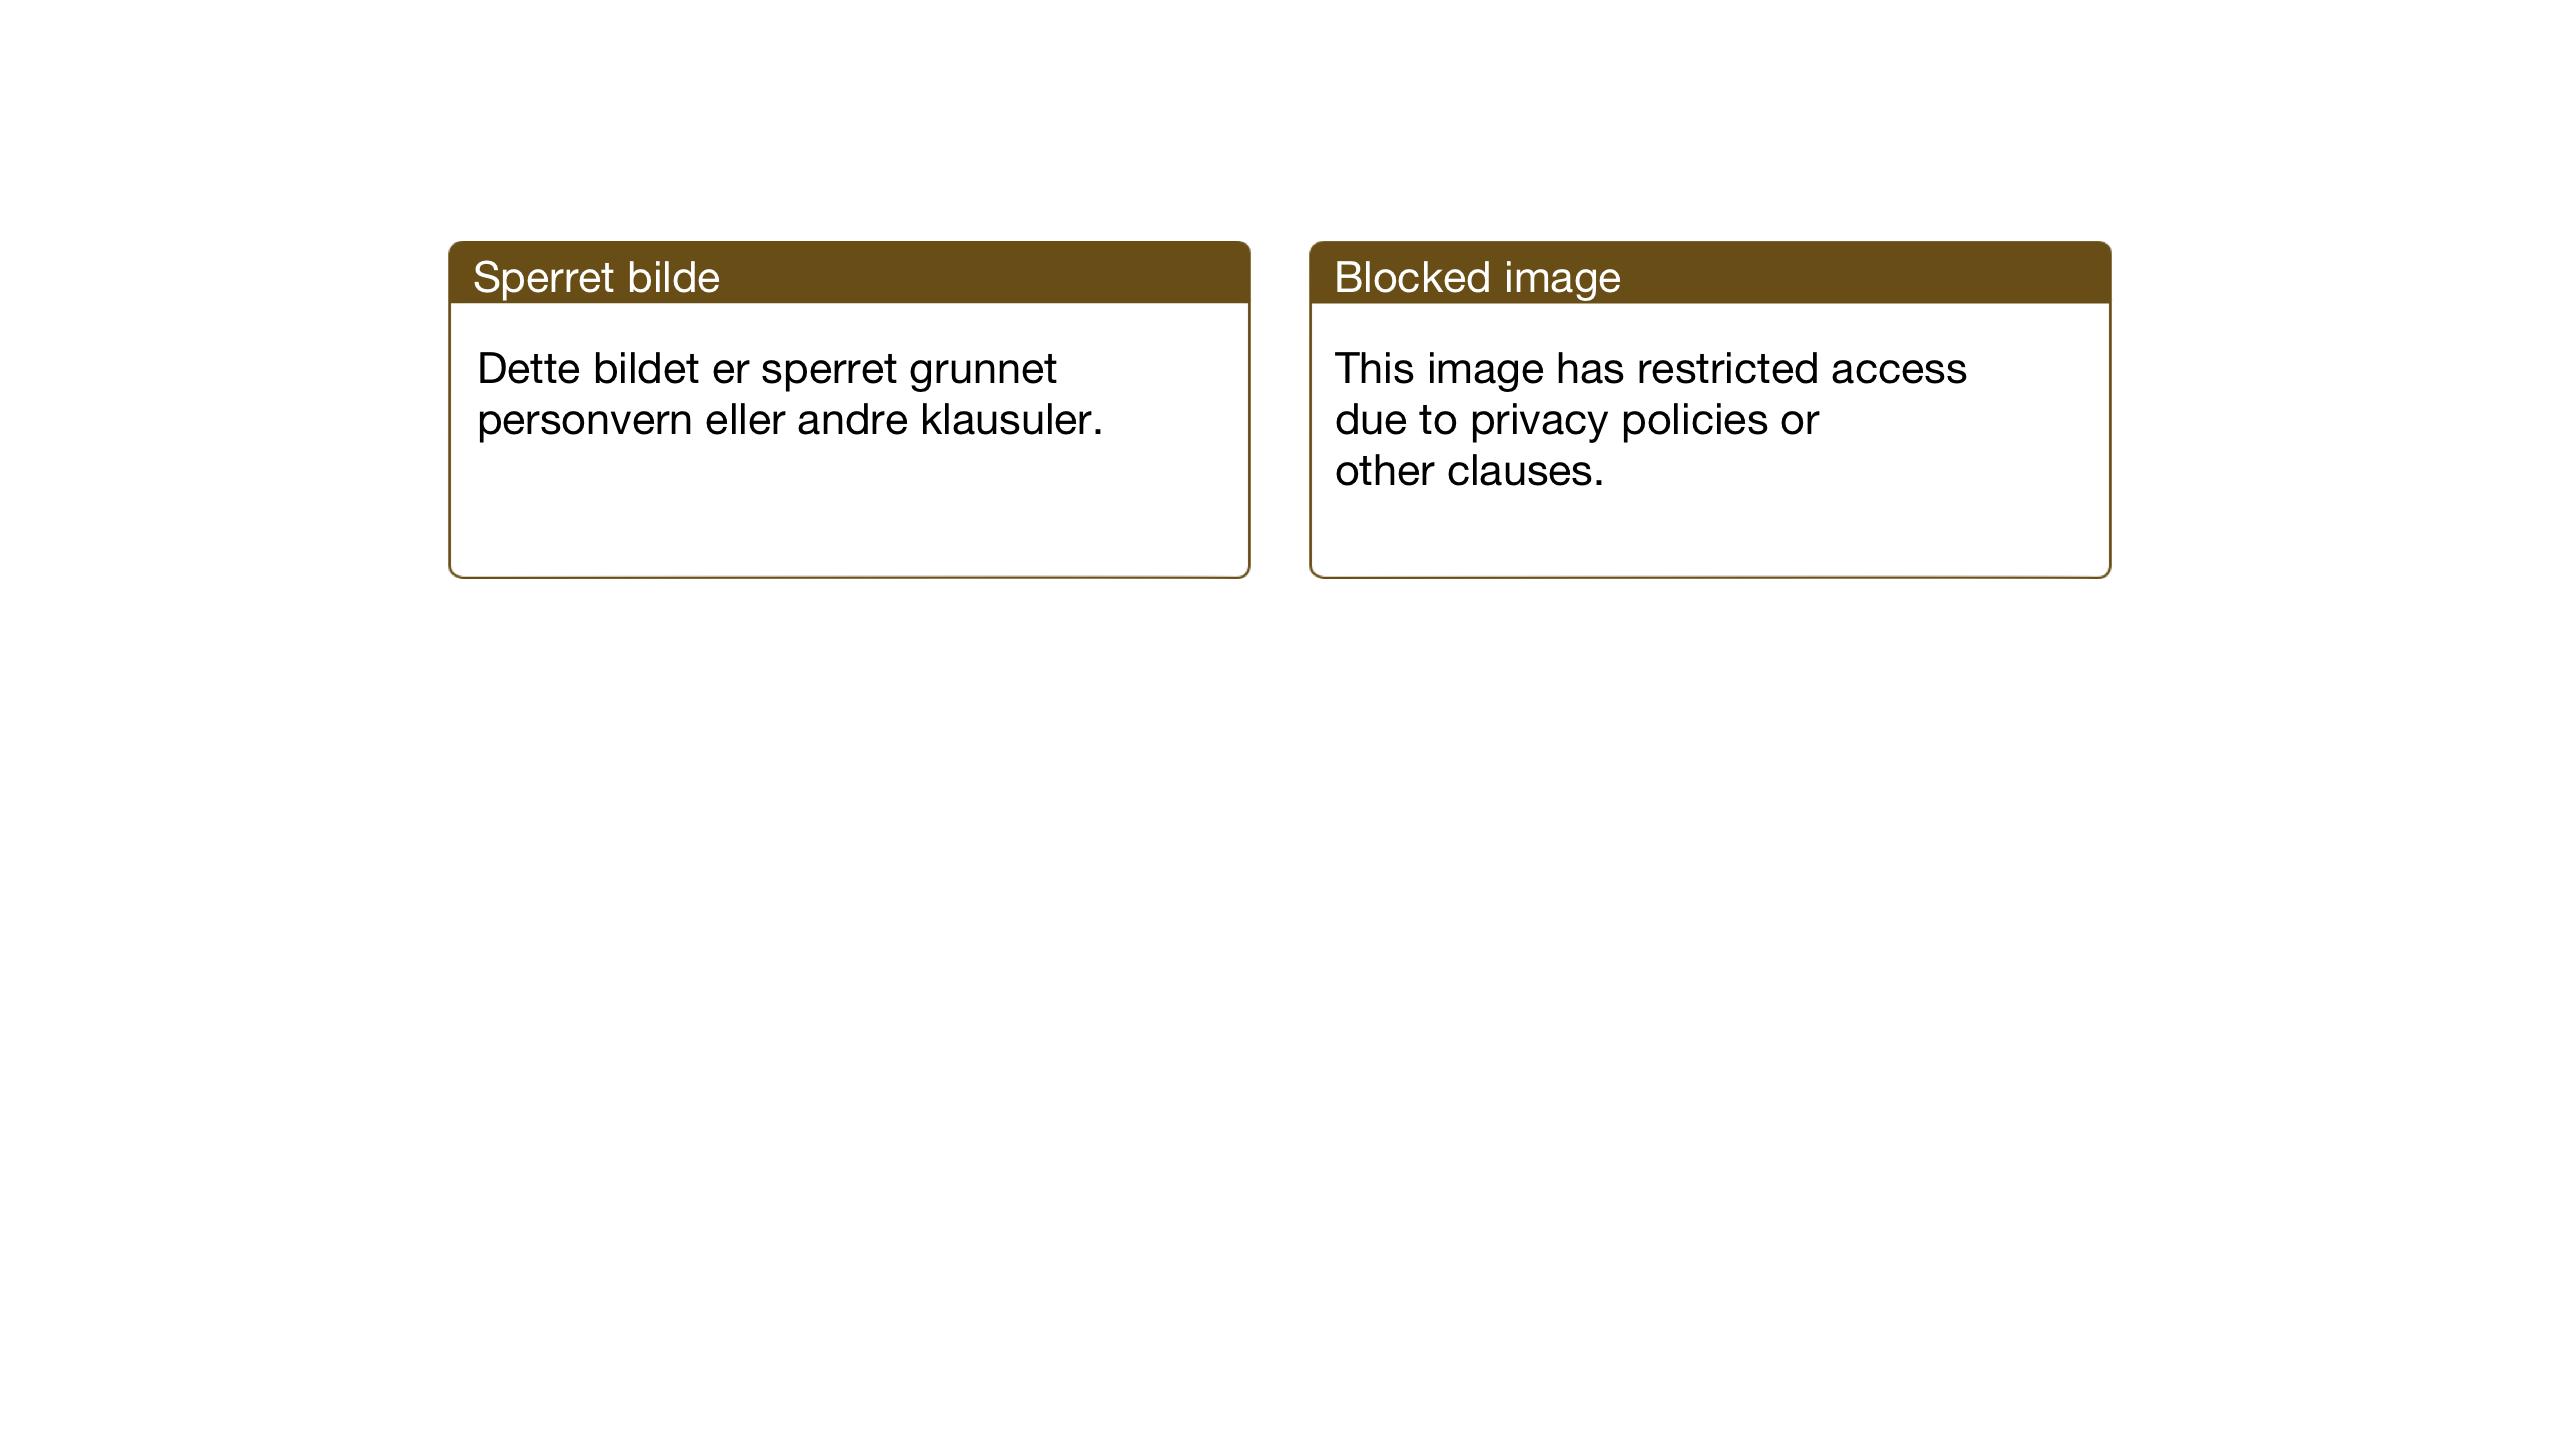 SAT, Ministerialprotokoller, klokkerbøker og fødselsregistre - Nordland, 847/L0680: Klokkerbok nr. 847C08, 1930-1947, s. 13